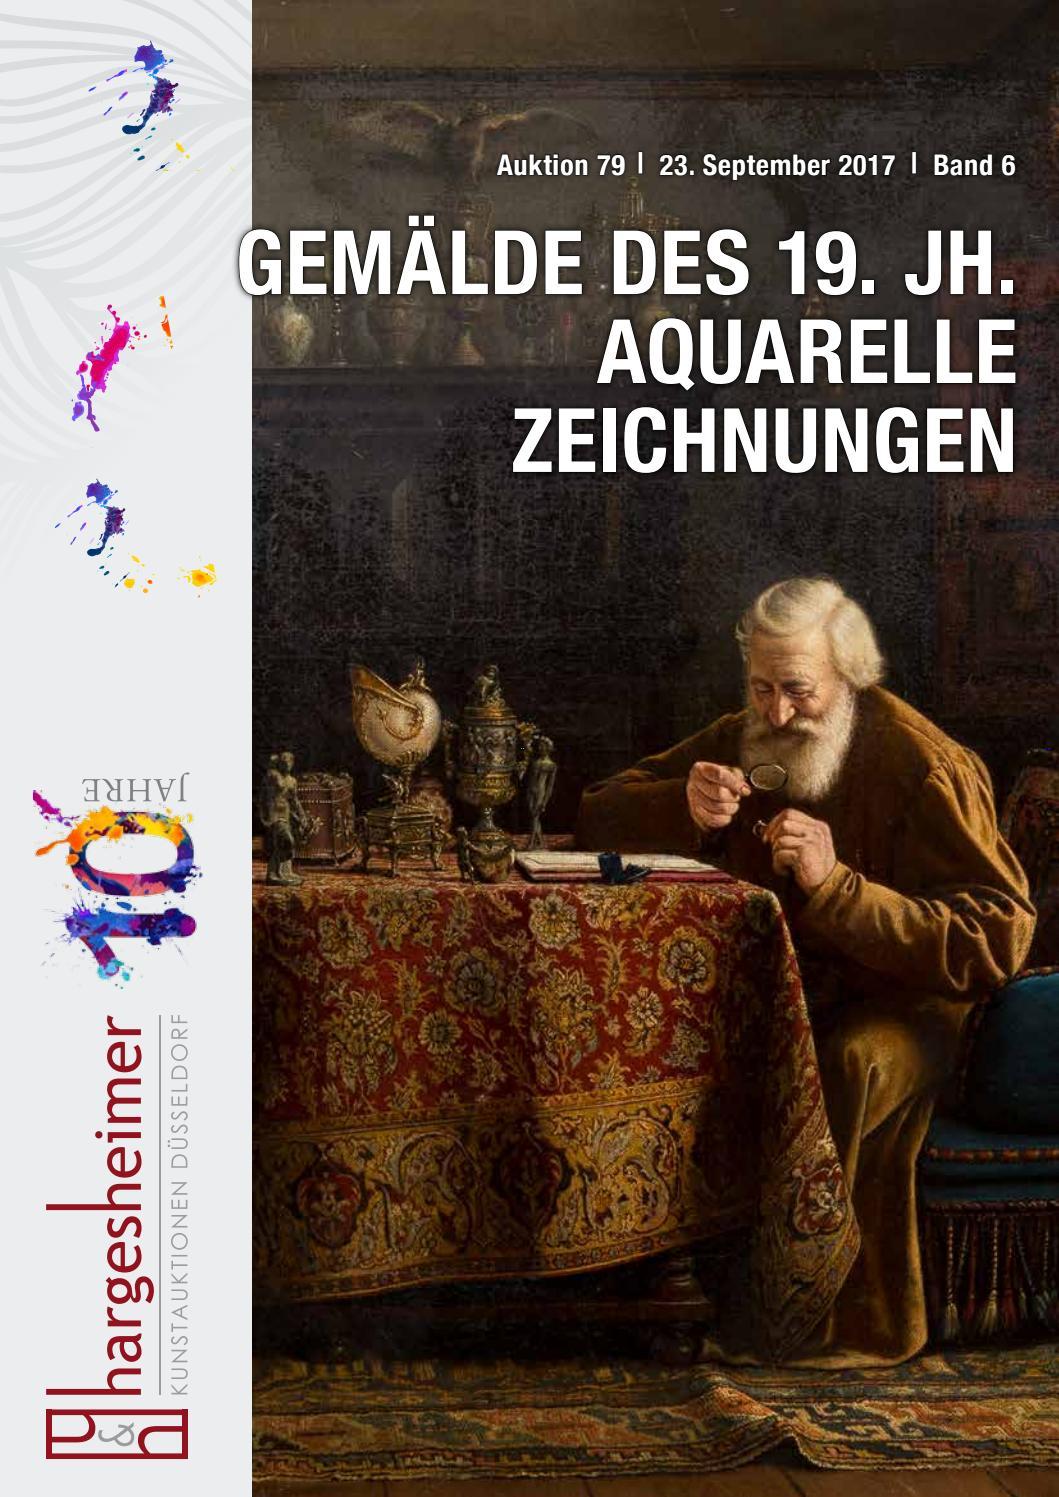 hans hofmann ten major works january 11 30 1969